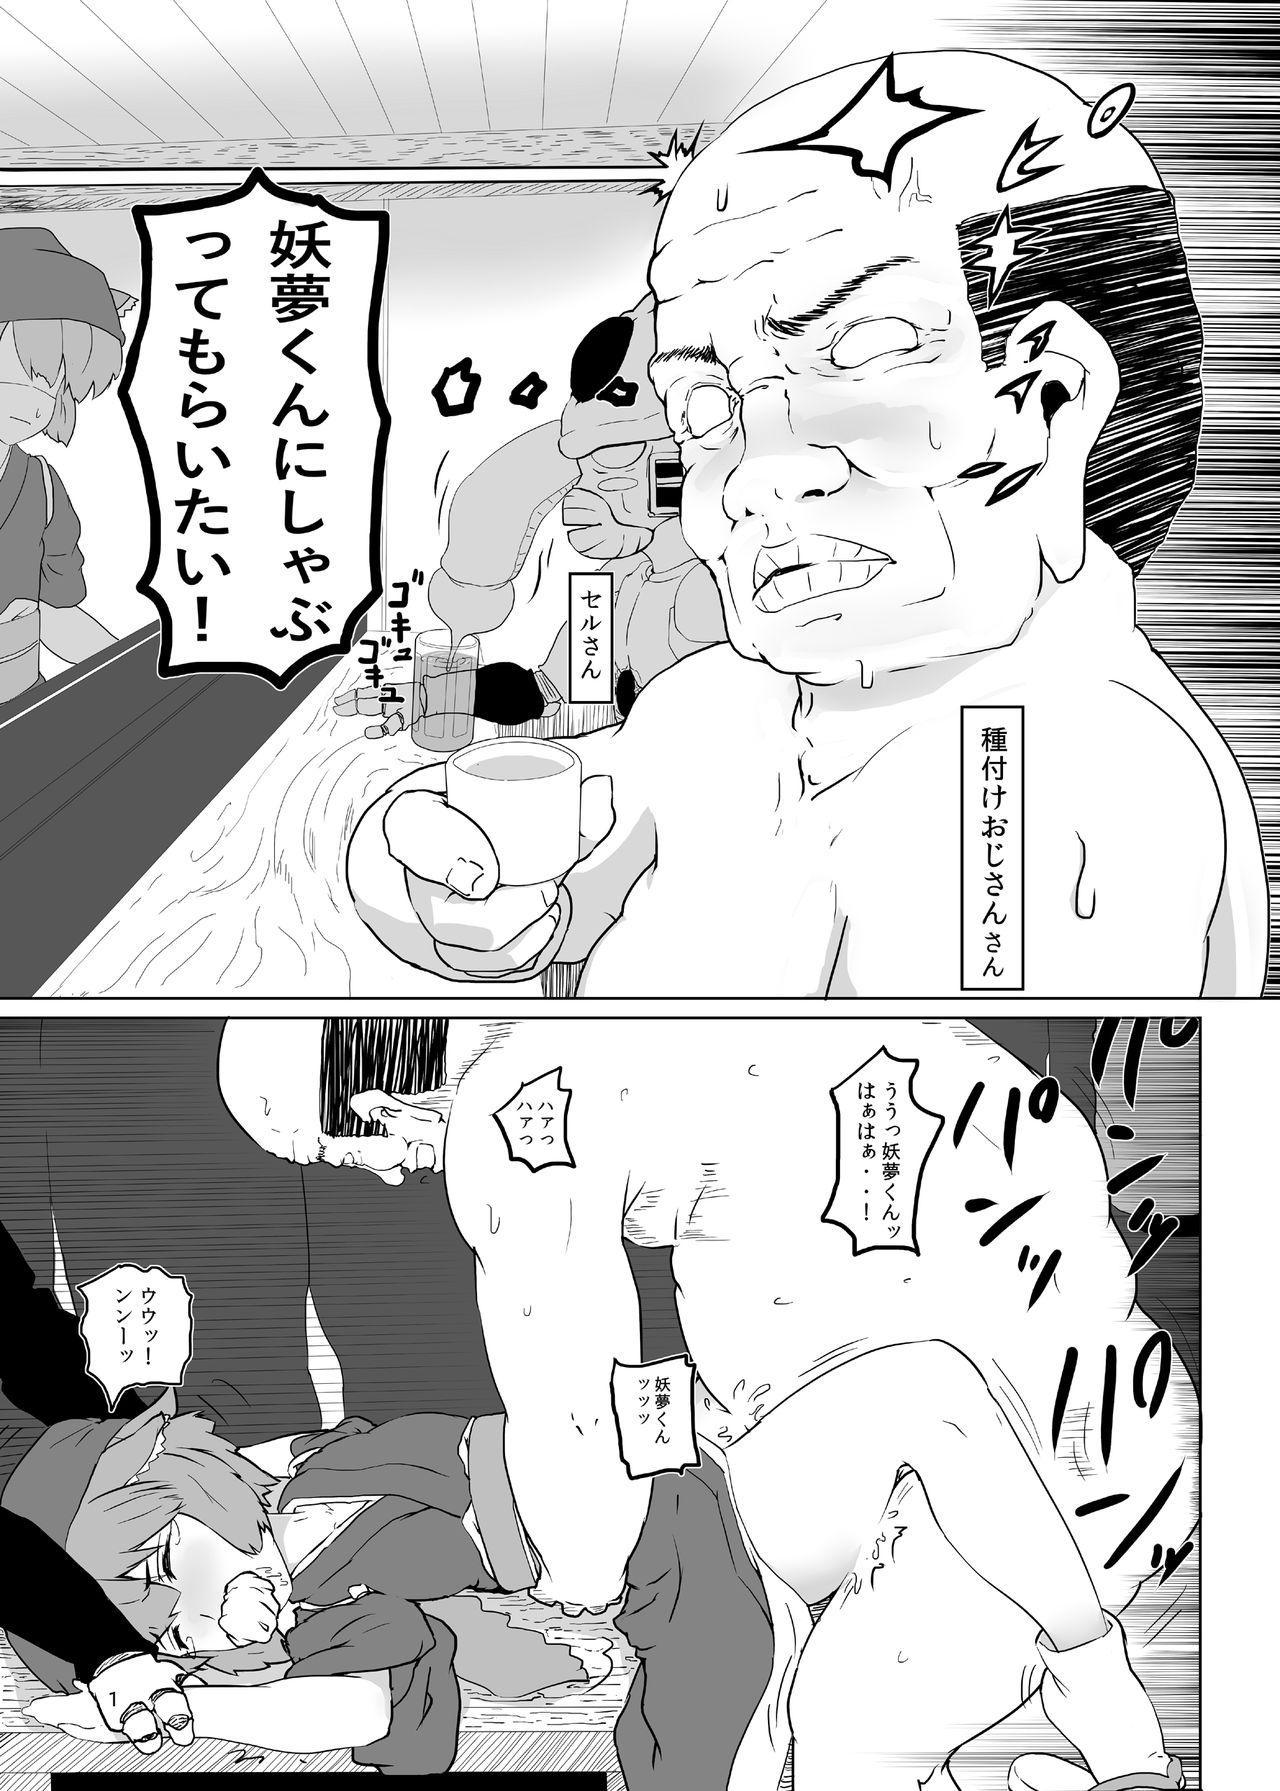 [Hayaku Byouin e Itte Kudasai. (Byoin)] Youmu-kun (Juuyou) ni Shabutte Moraitai. (Touhou Project) [Digital] 1